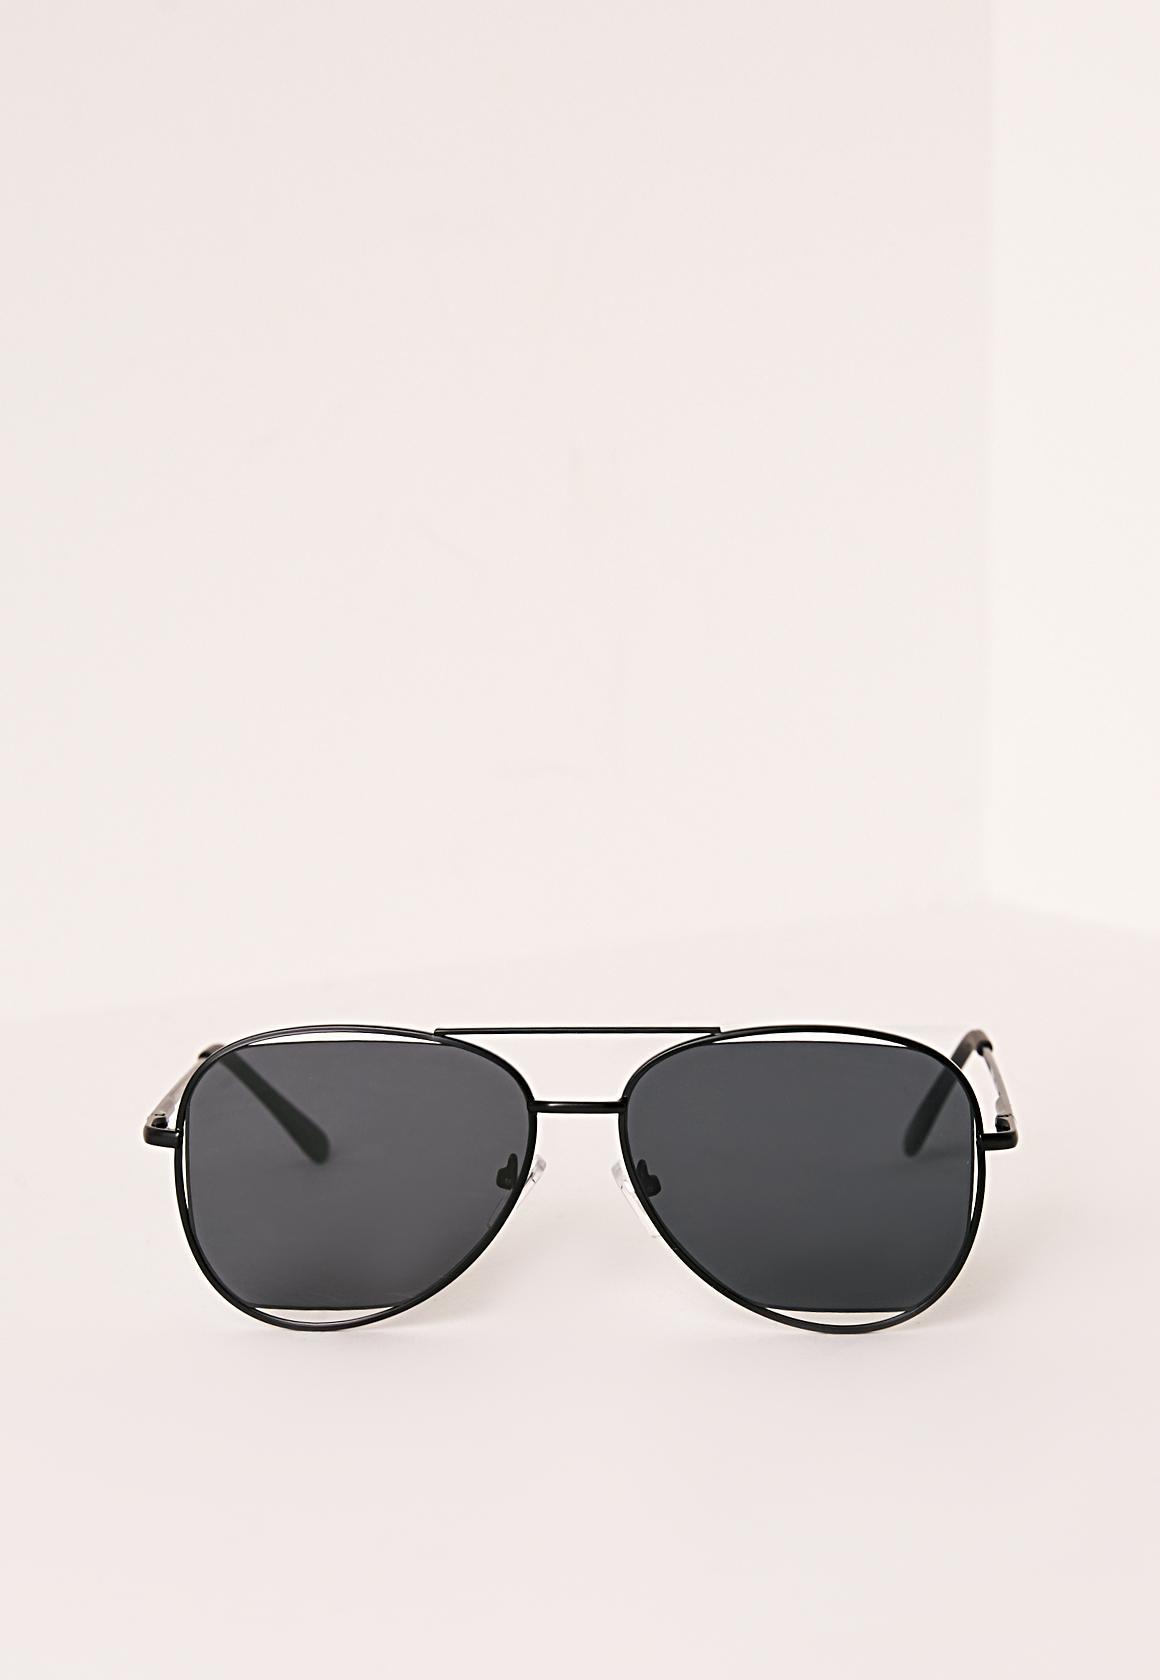 Aviator Black Sunglasses L2yp